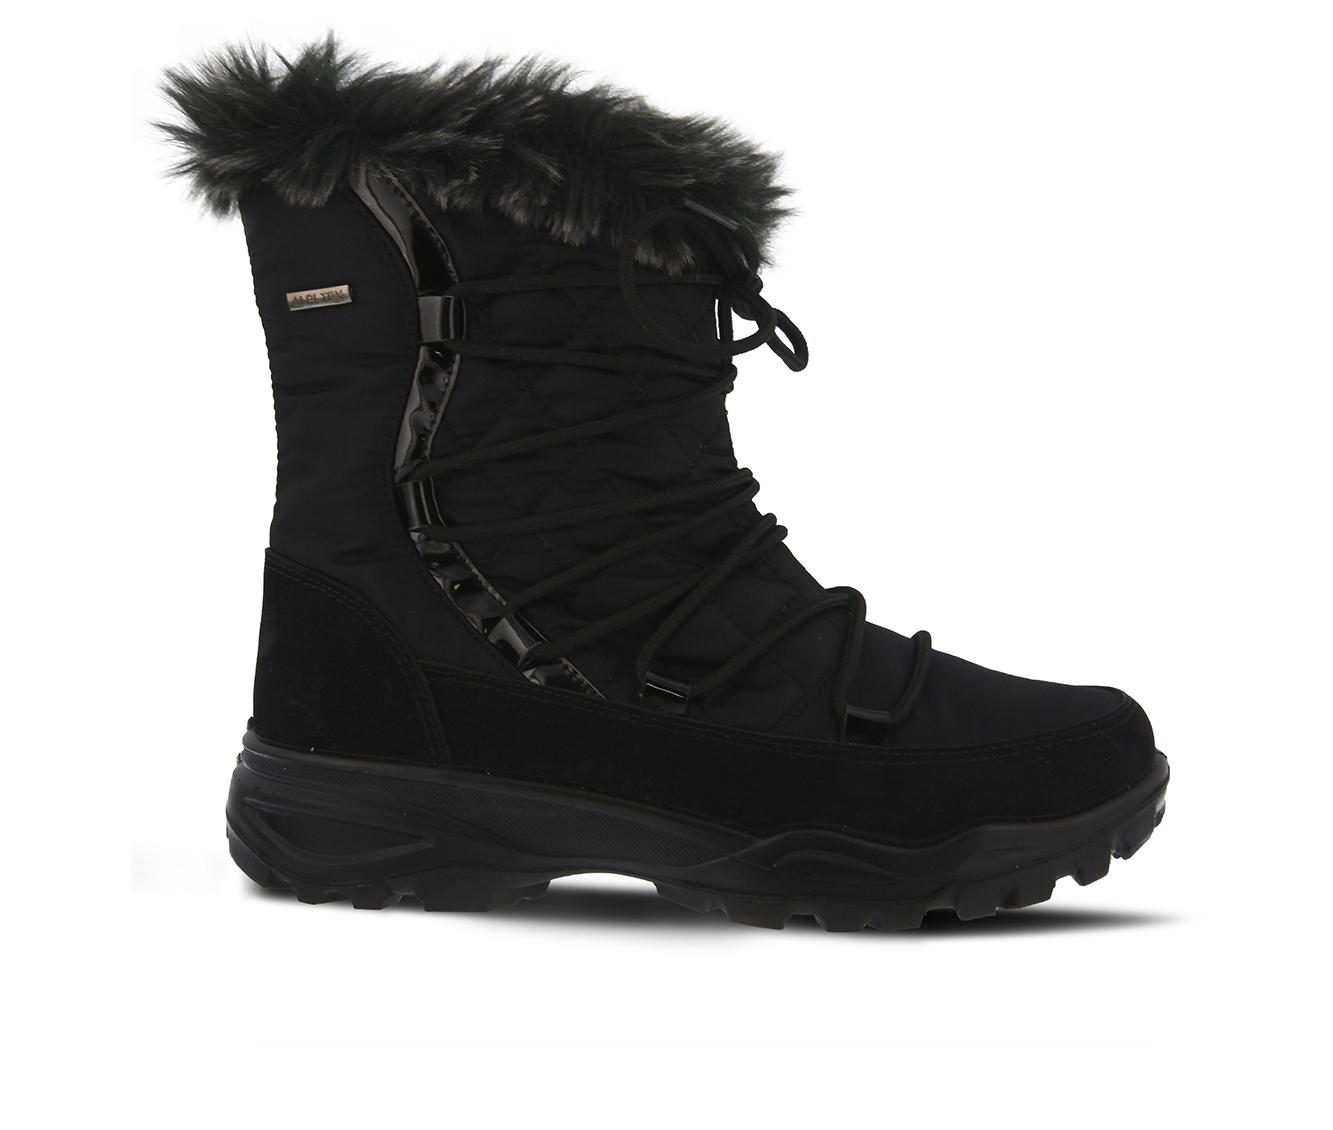 Flexus Denilia Women's Boots (Black Canvas)